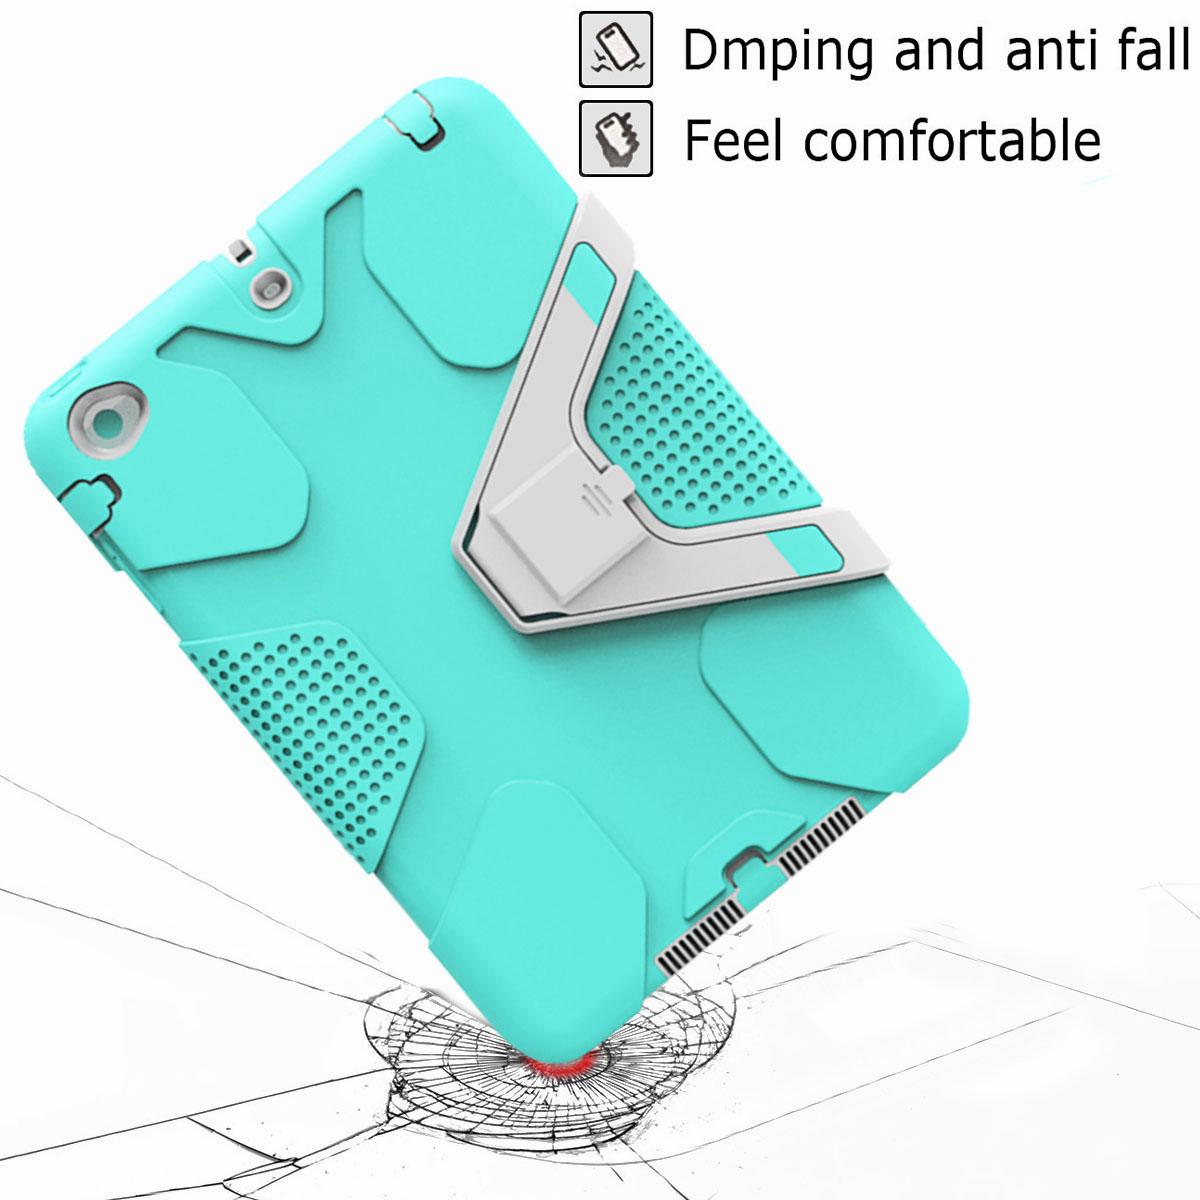 Luxury-Shockproof-Tough-Armor-with-Hard-Kickstand-Case-For-Apple-iPad-Mini-1-2-3 thumbnail 15